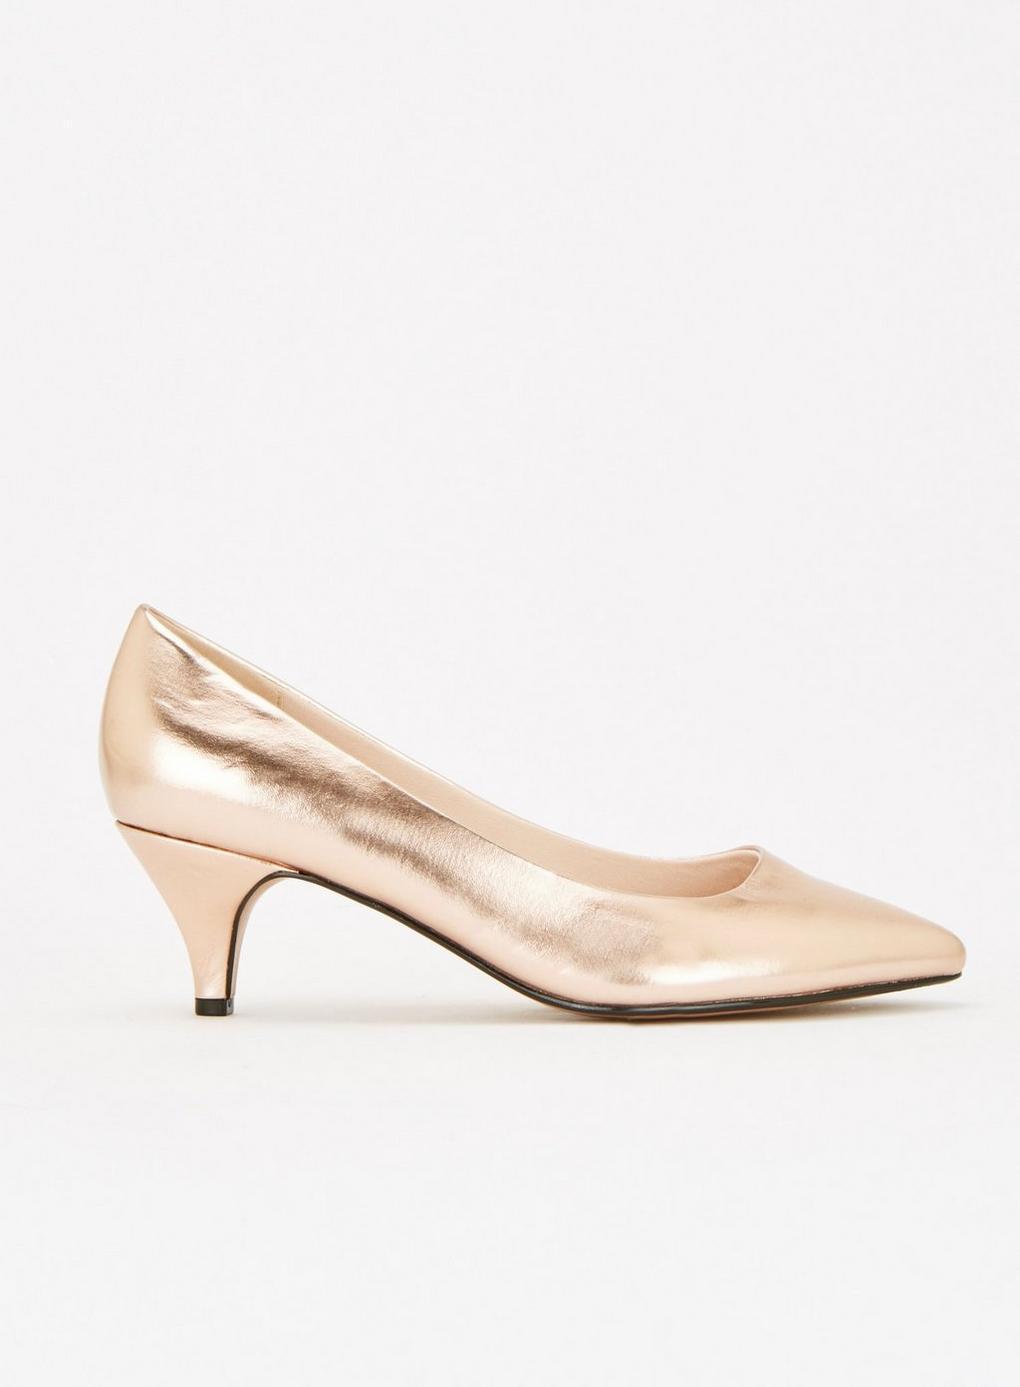 8b3f4874989 Evans Extra Wide Fit Gold Kitten Heel Court Shoes in Metallic - Lyst